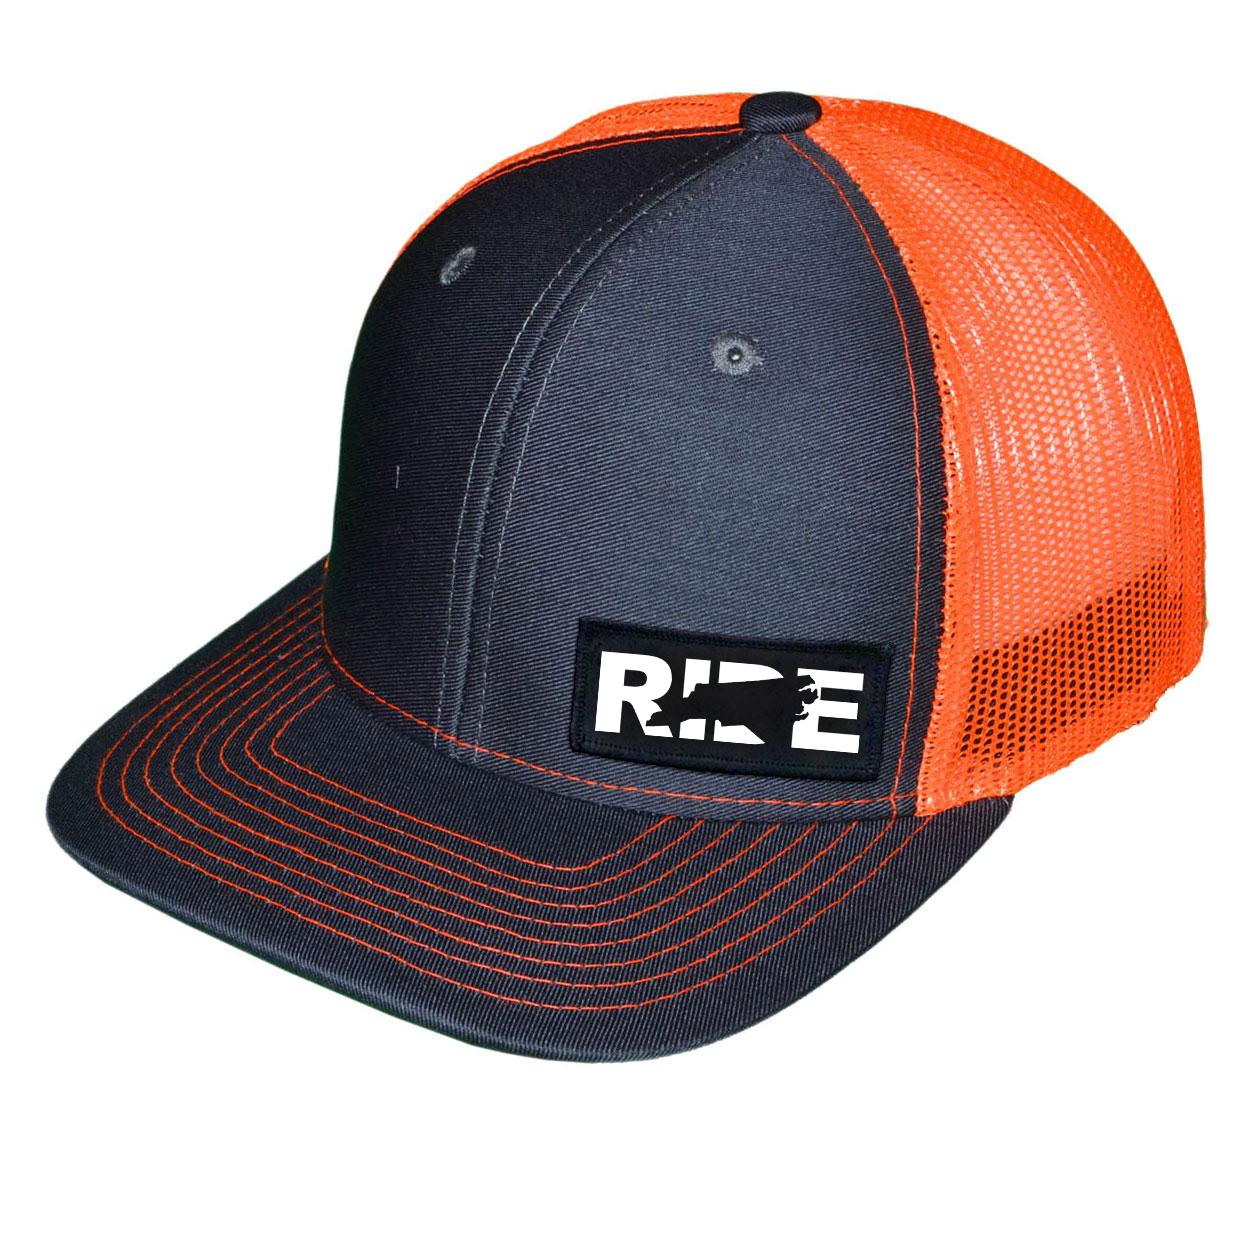 Ride North Carolina Night Out Woven Patch Snapback Trucker Hat Dark Gray/Orange (White Logo)